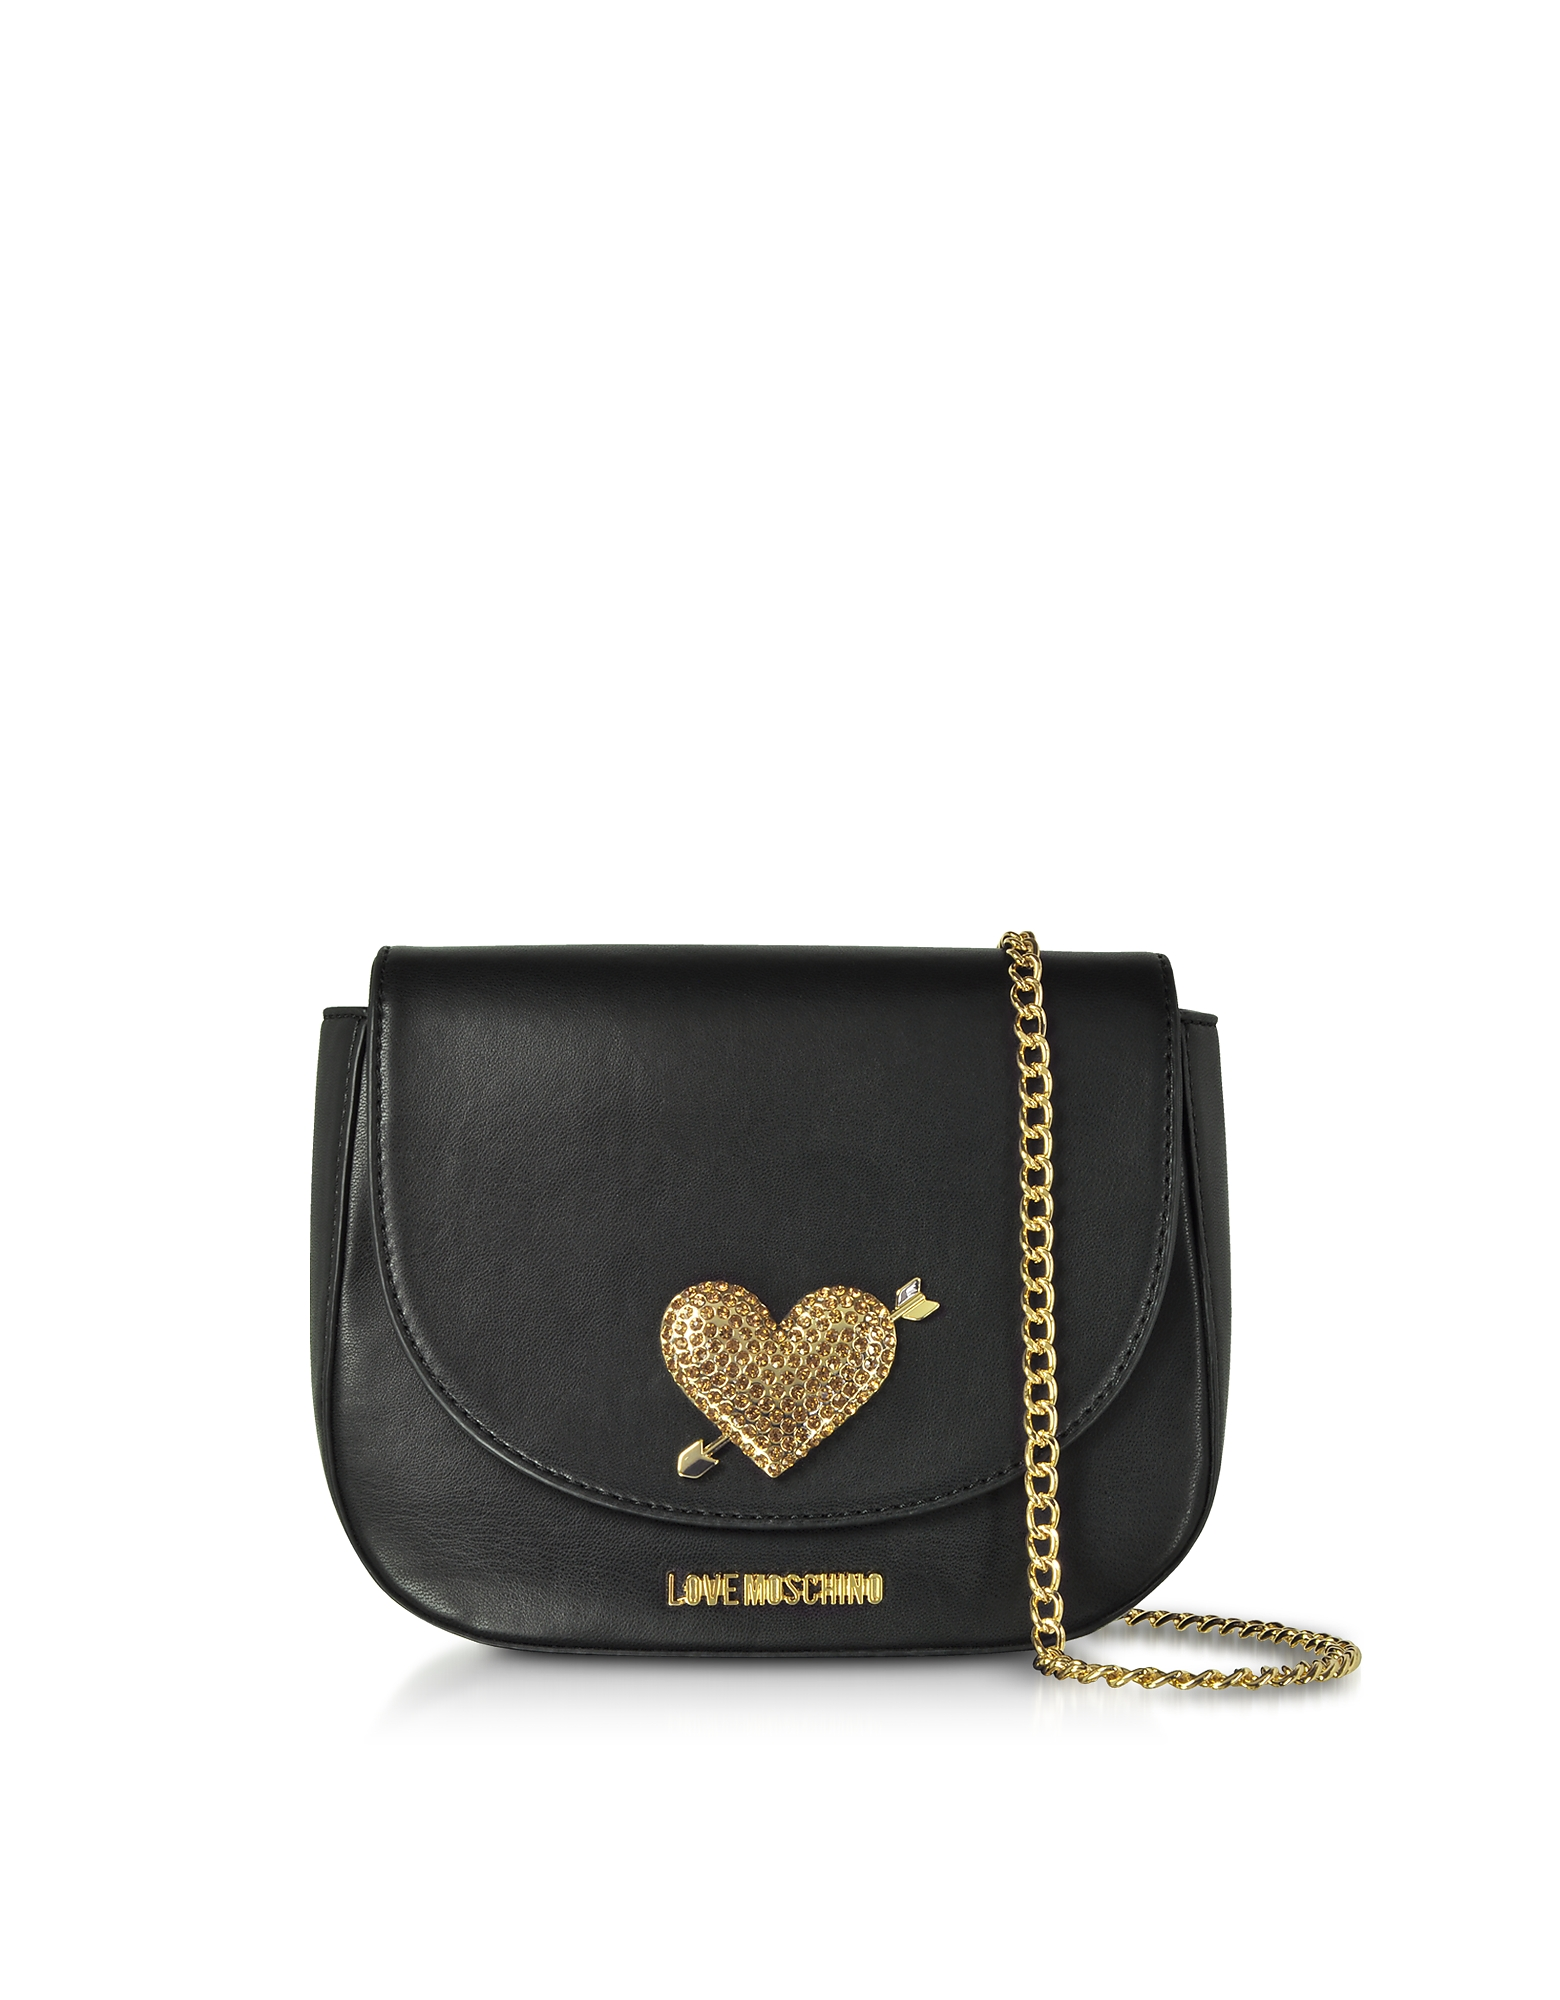 LOVE MOSCHINO Evening Bag Crossbody W/Strass in Black